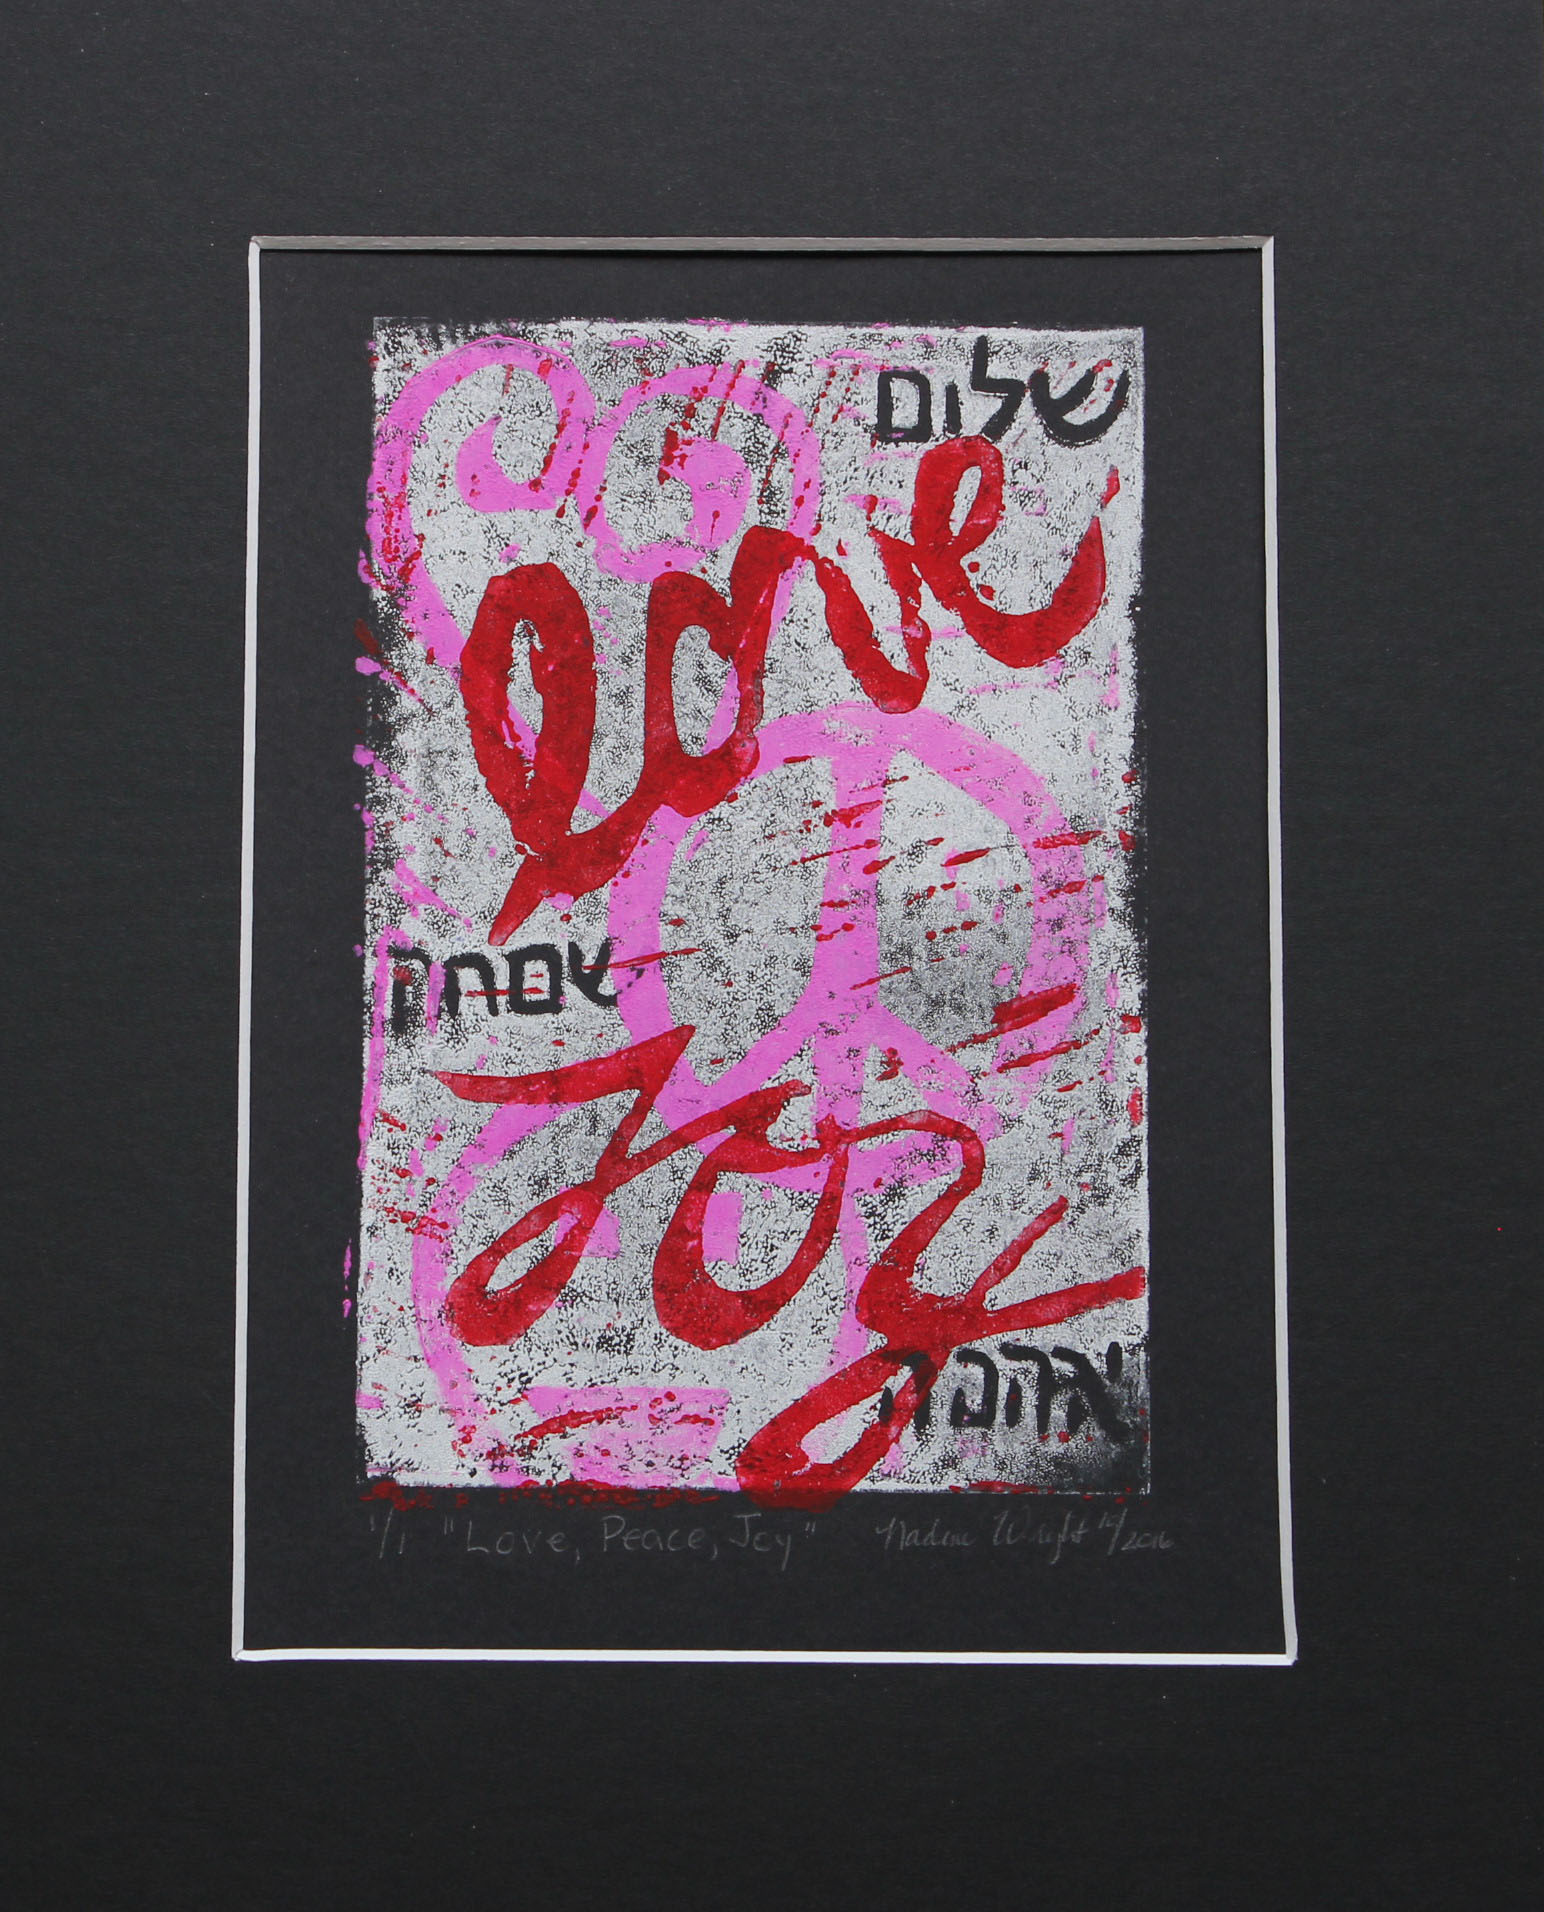 pink Love, Peace, Joy